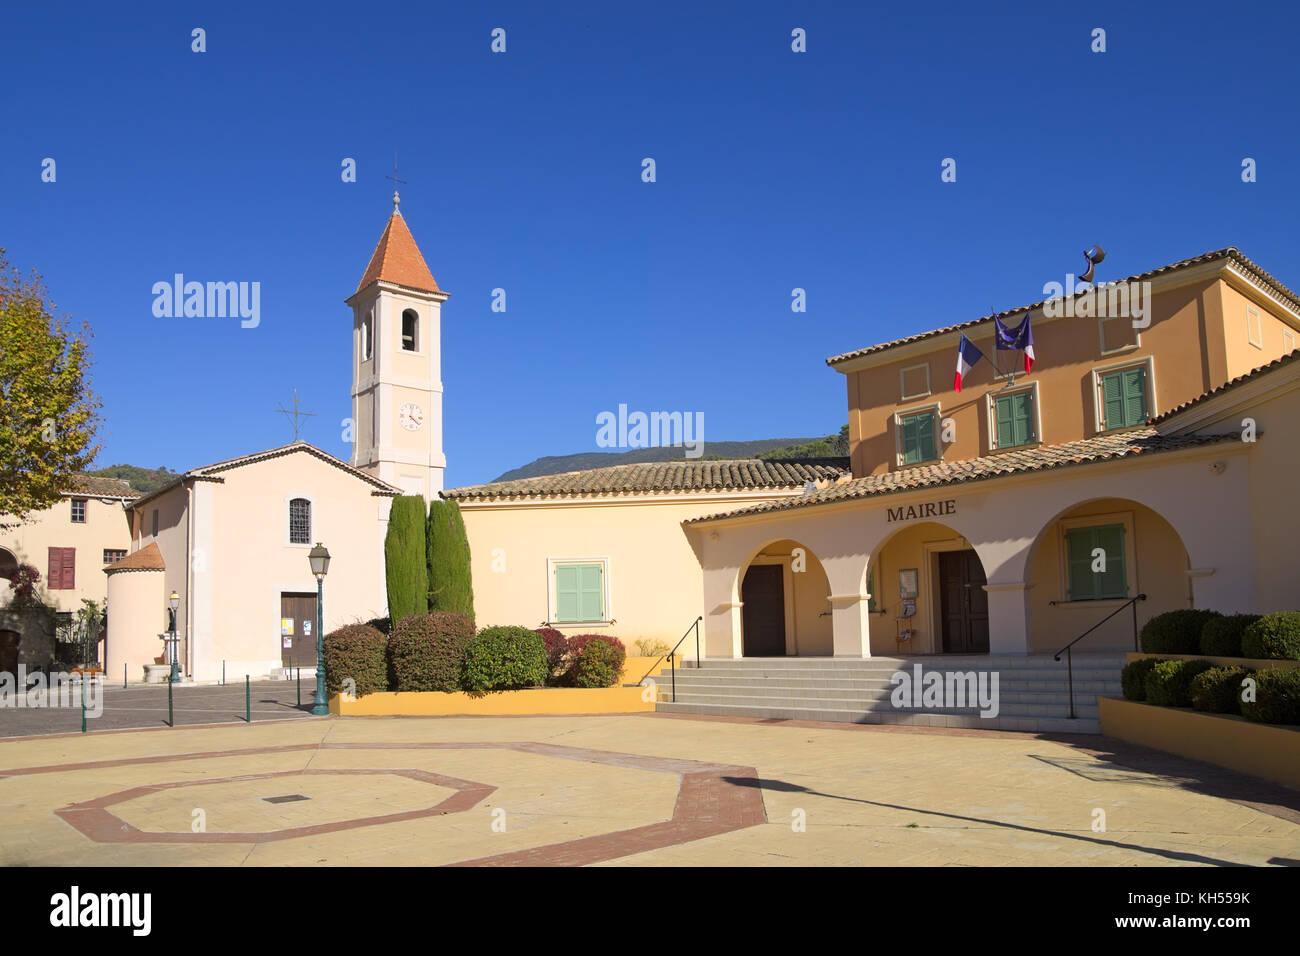 saint-blaise-is-a-village-in-the-alpes-m